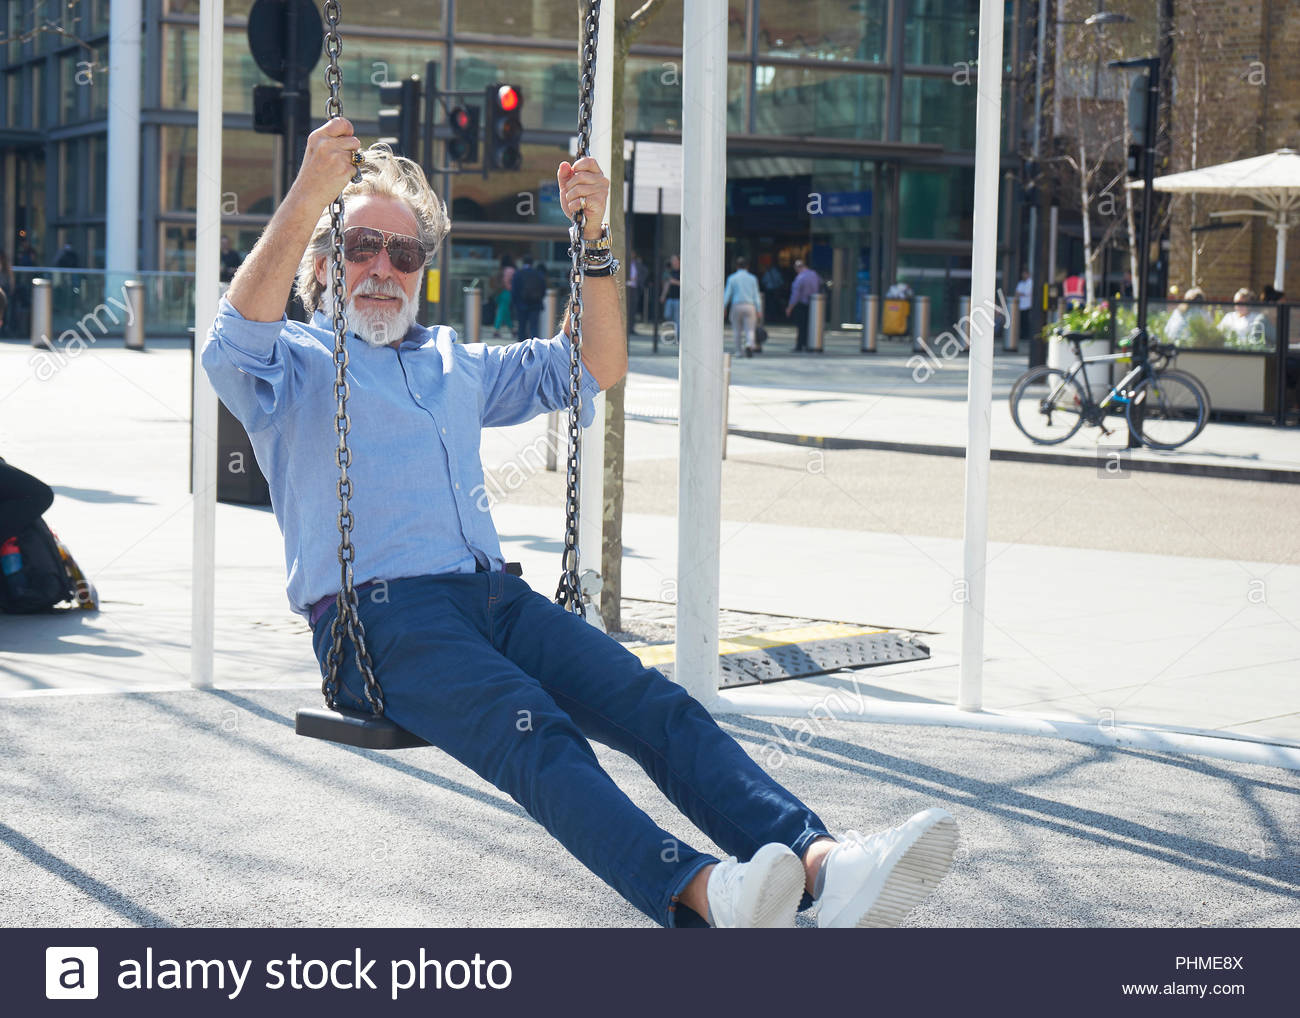 Senior man on swing Photo Stock